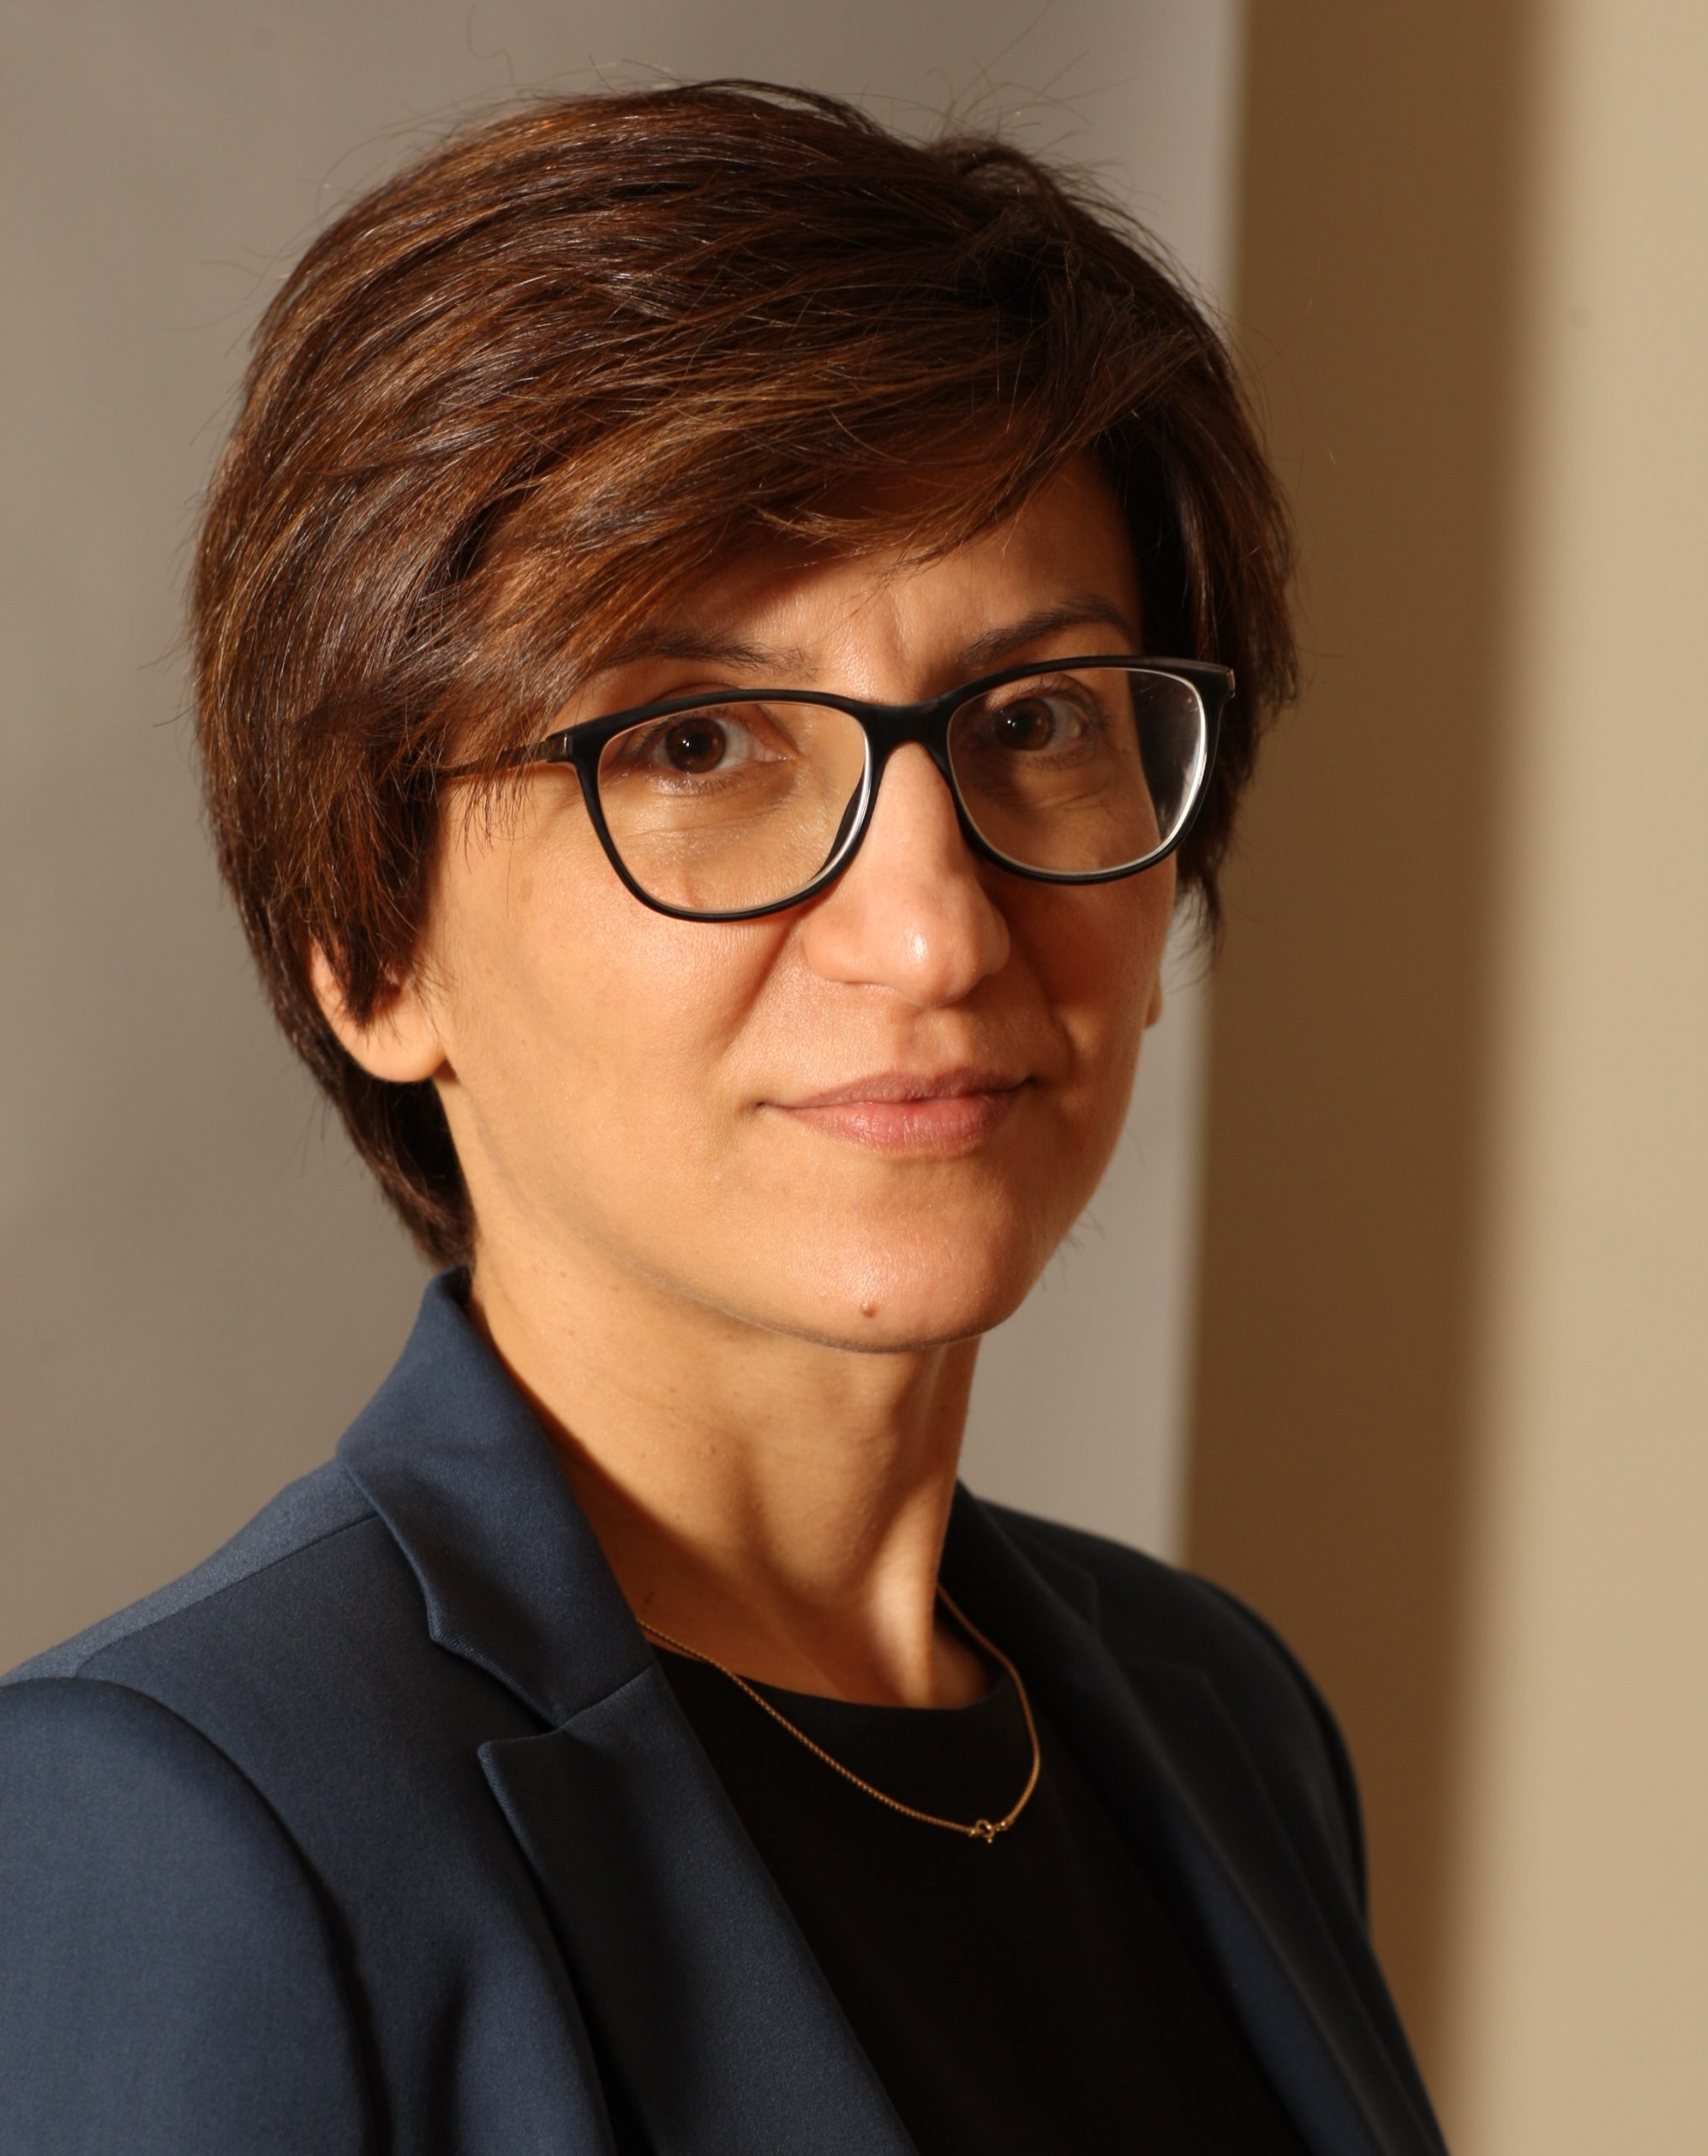 Анжелика Мирзоева